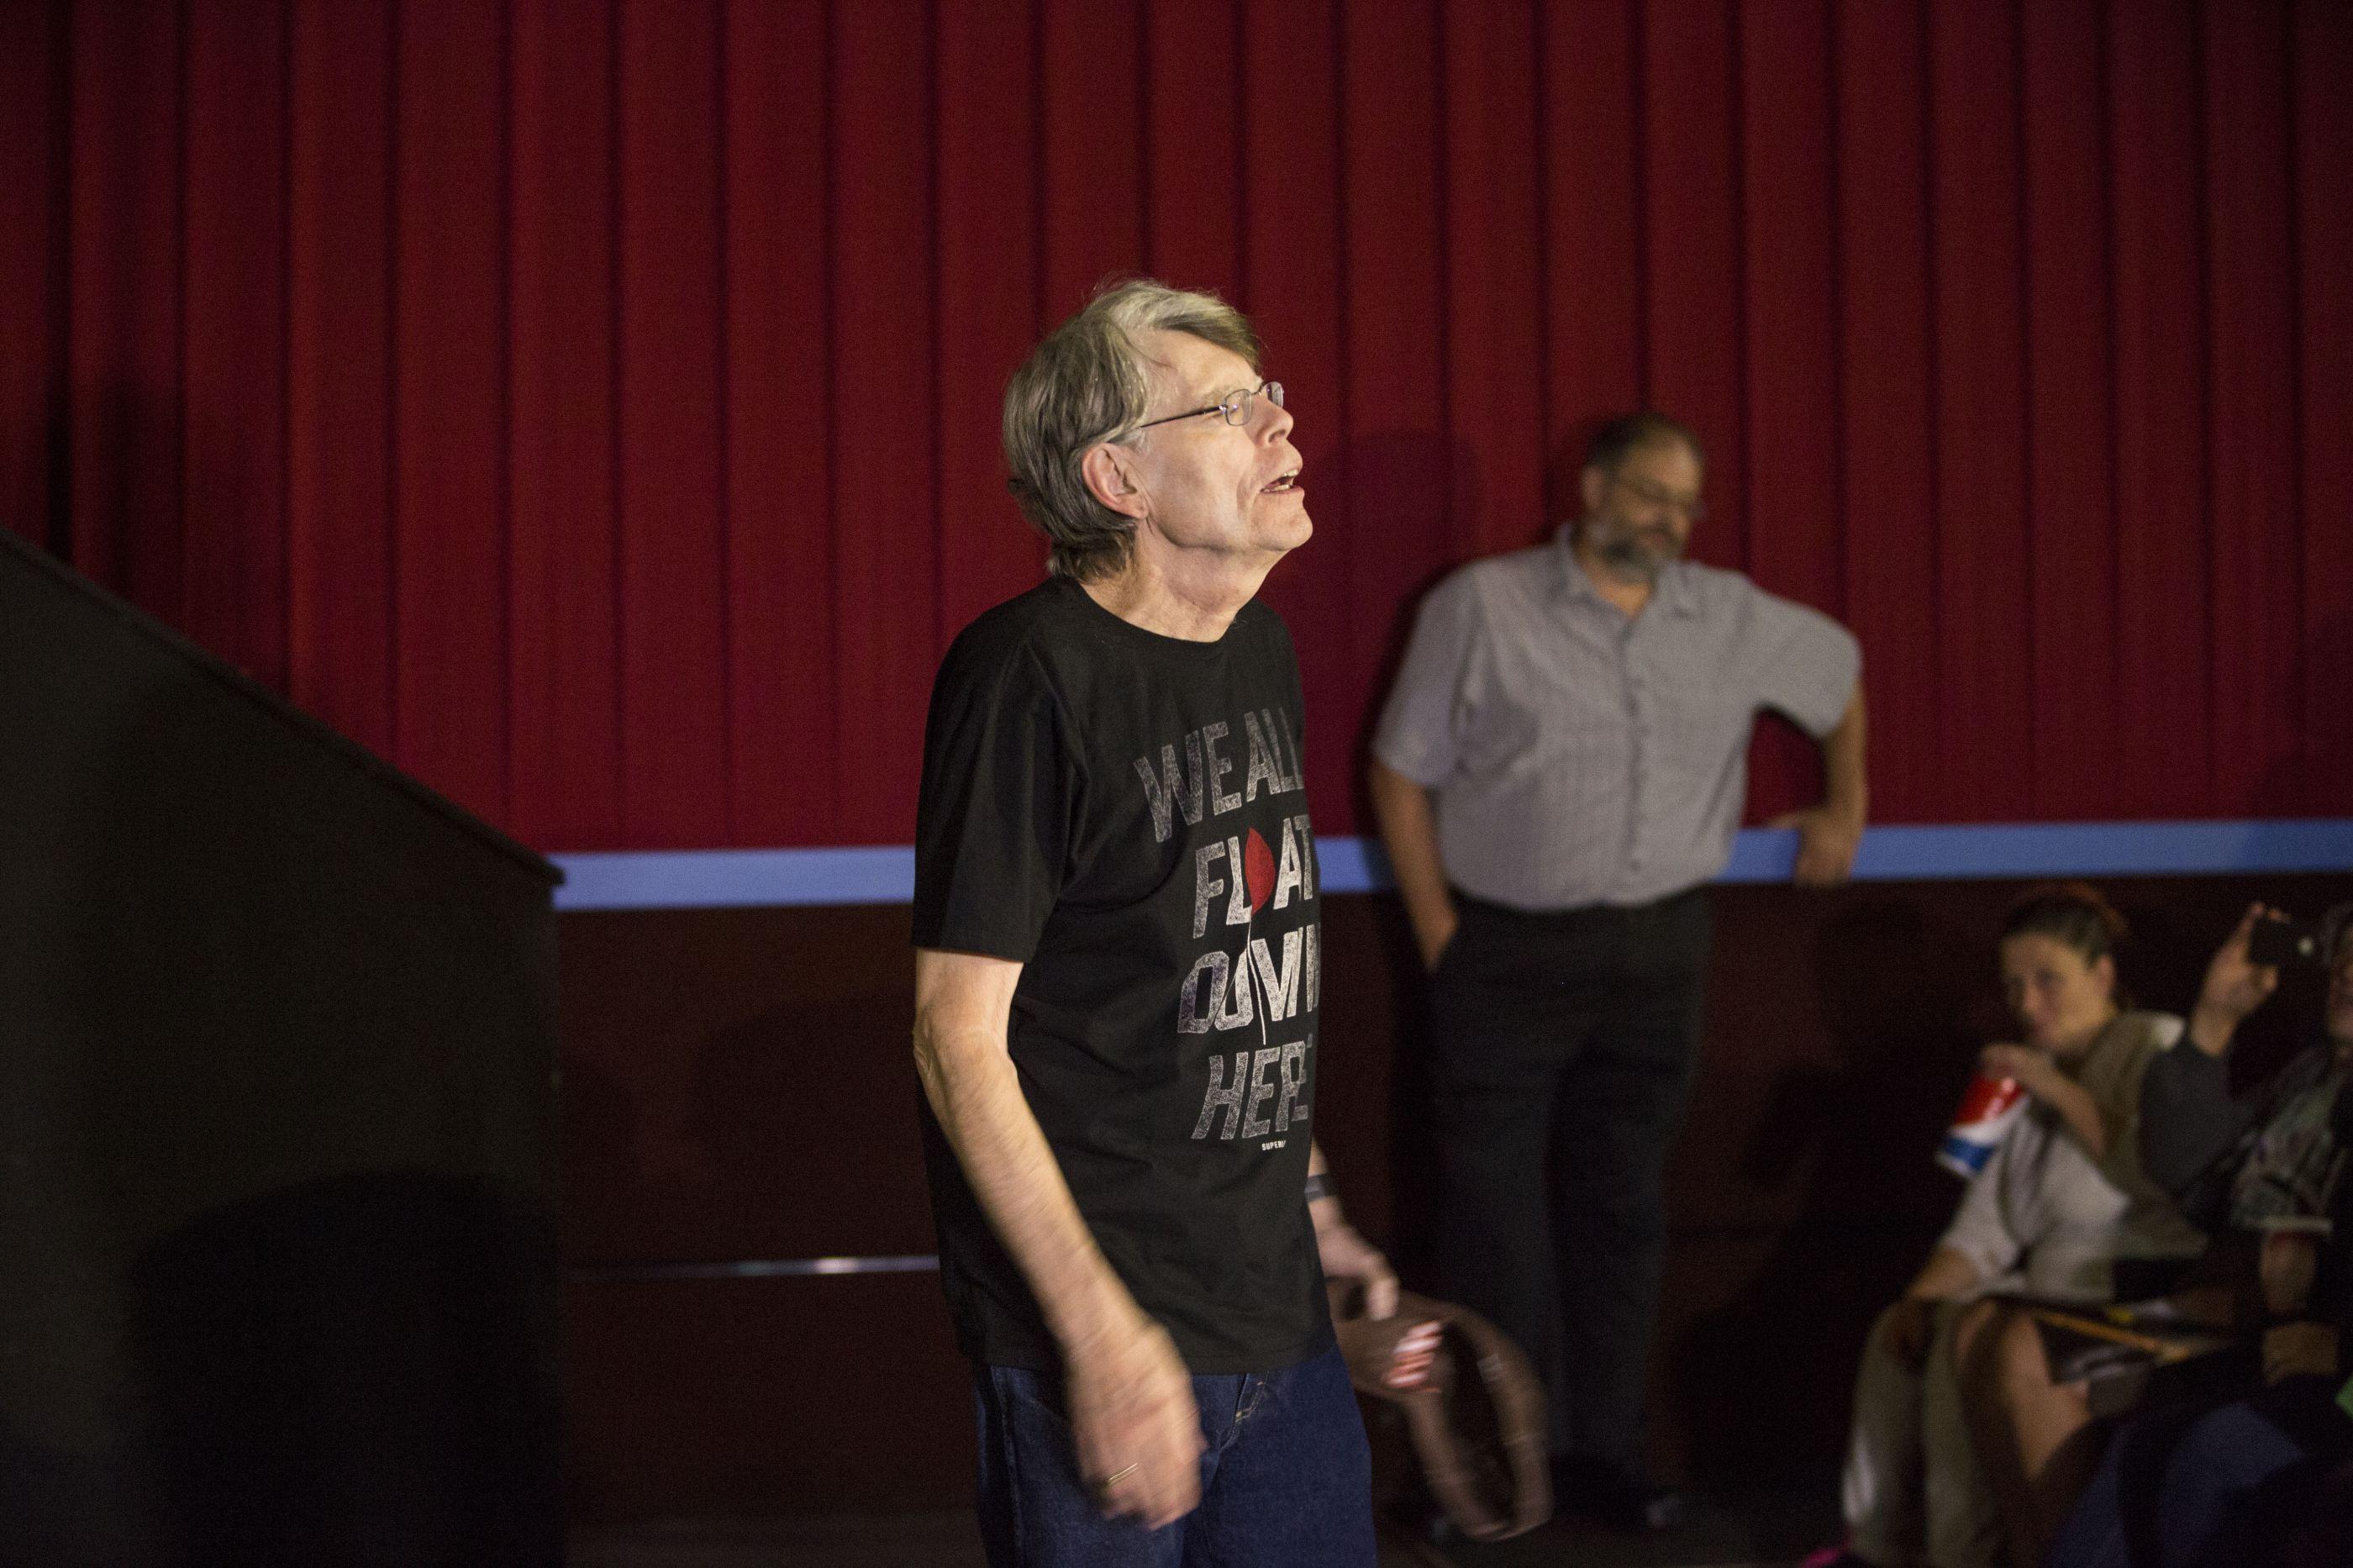 Stephen King vende direitos de conto a dois adolescentes por 1 dólar